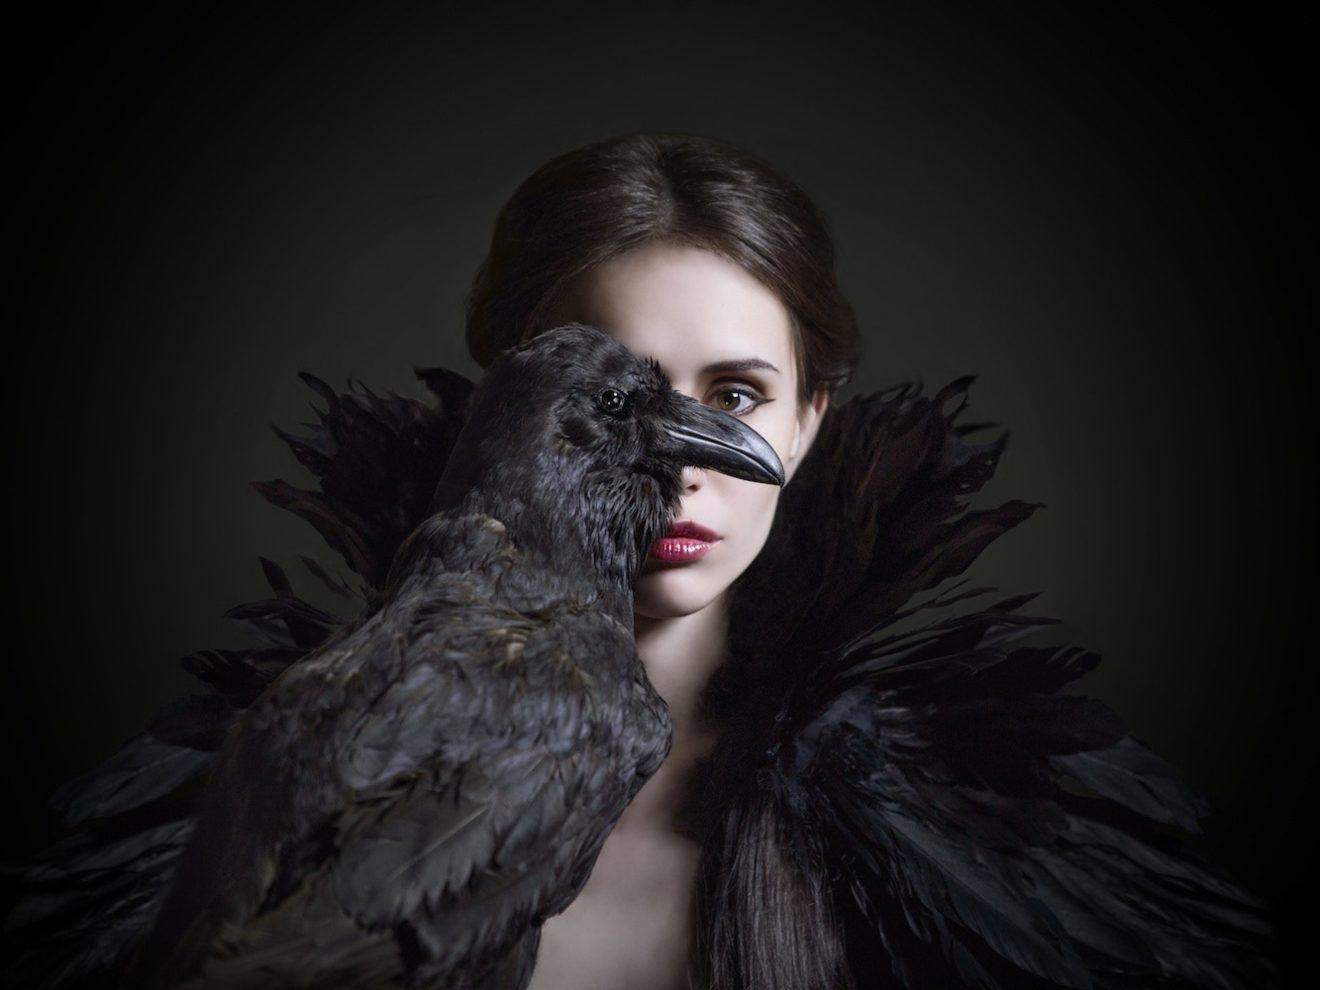 In Gothic Darkly Backgrounds: Heterotopia, History, Culture